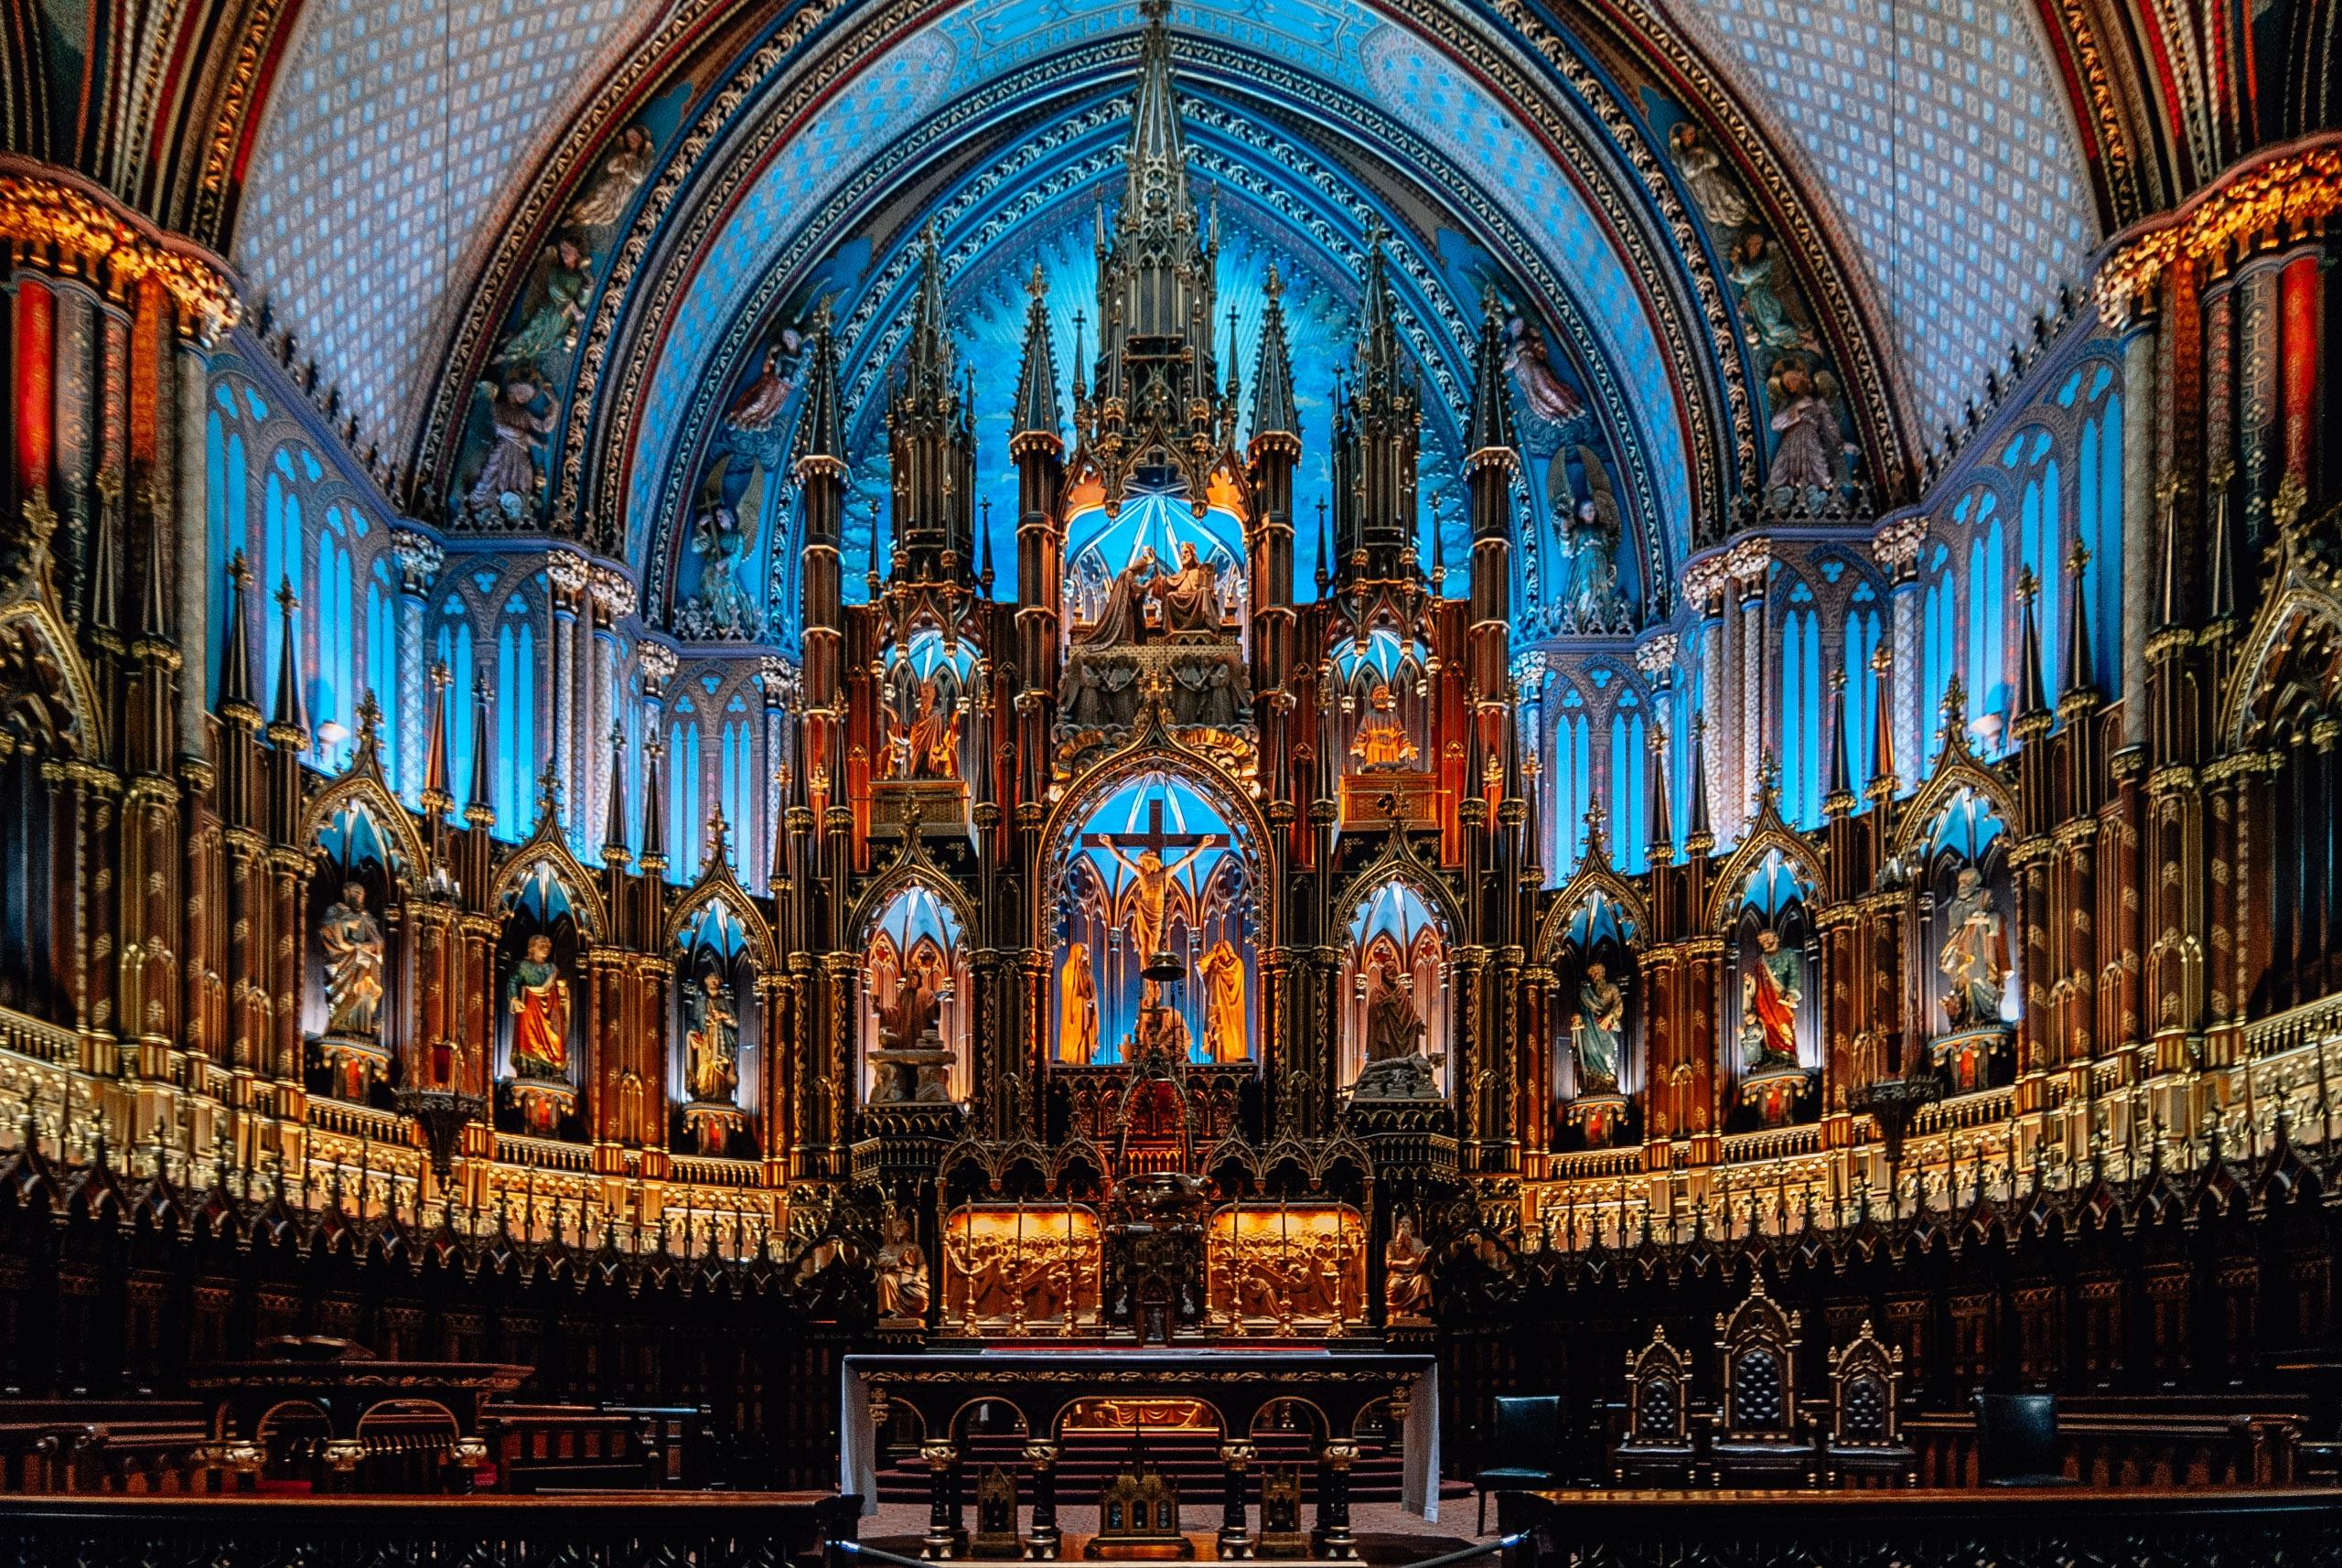 Canada - Montreal - 2010-0328-DSC_0127_13947